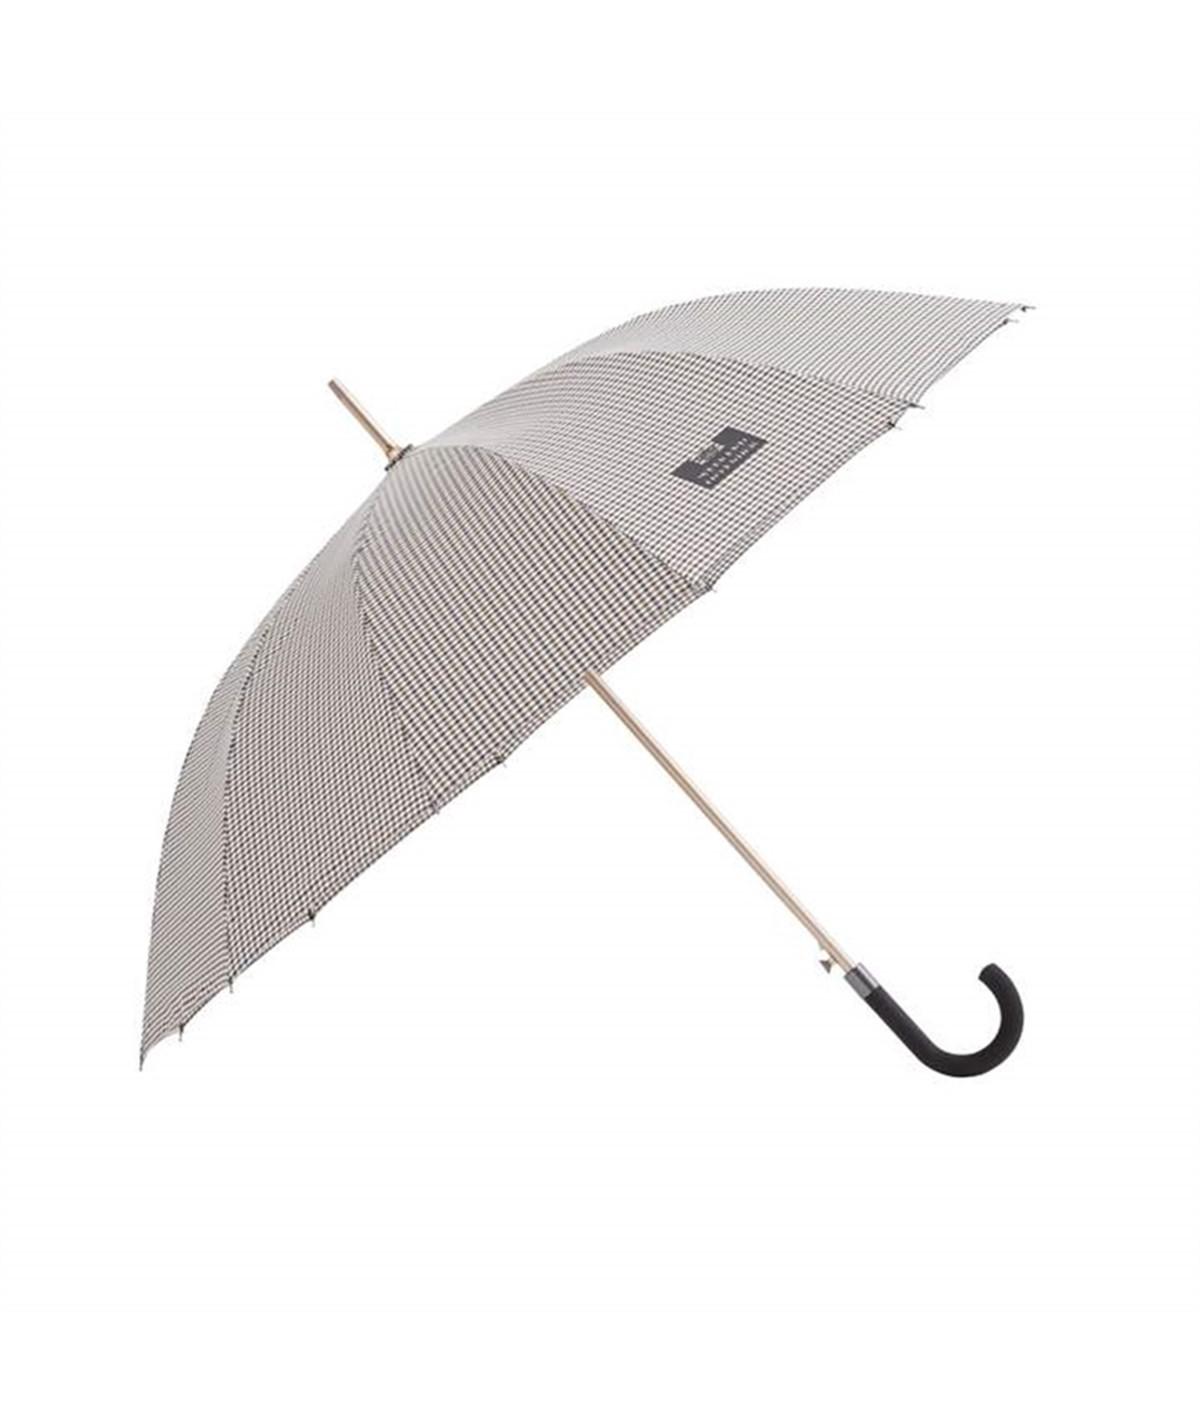 ACSS2101 ombrello weekend offender